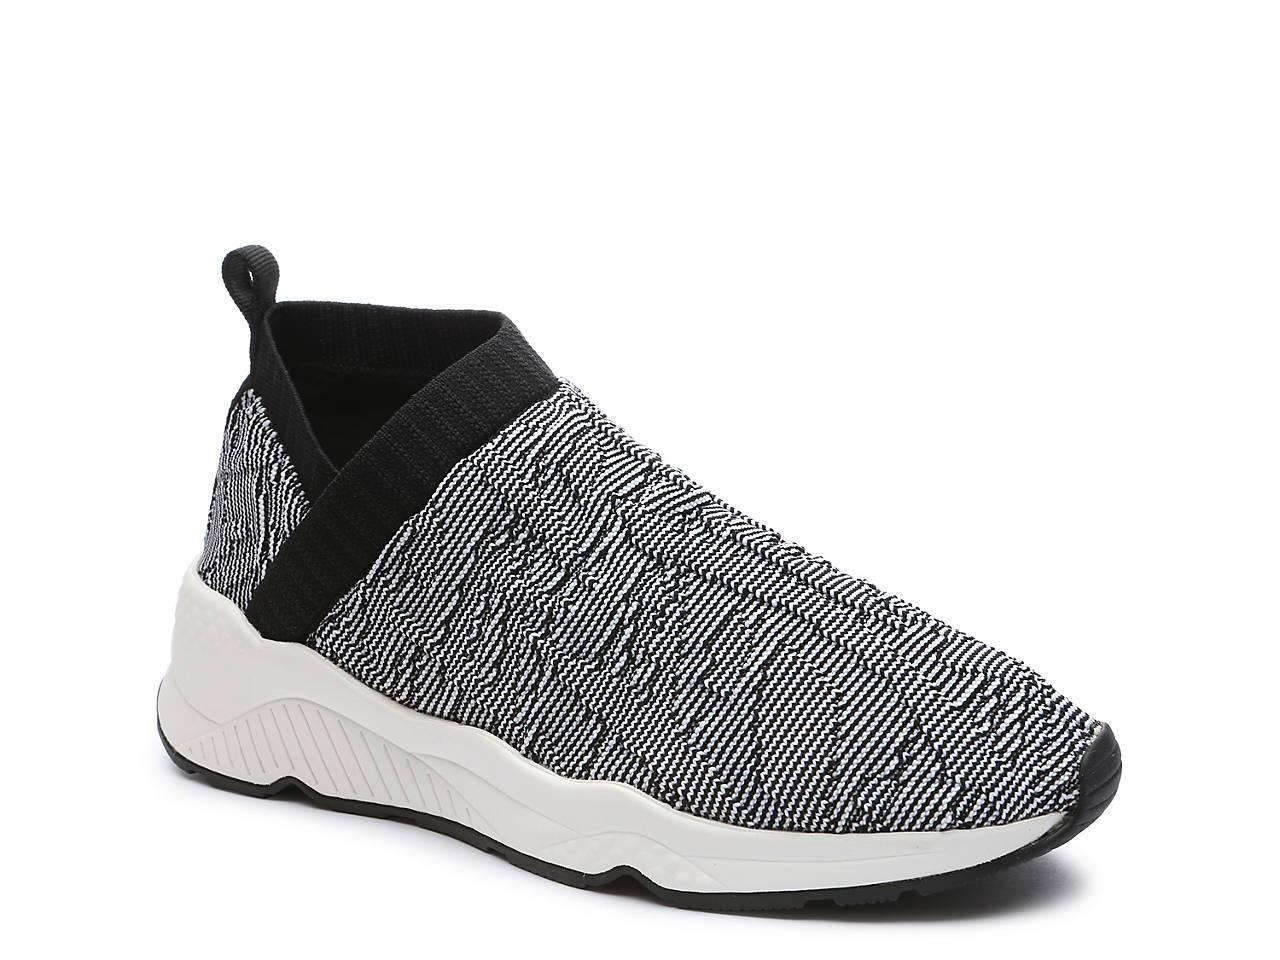 d120472515a5 Neesha Slip-On Sneaker